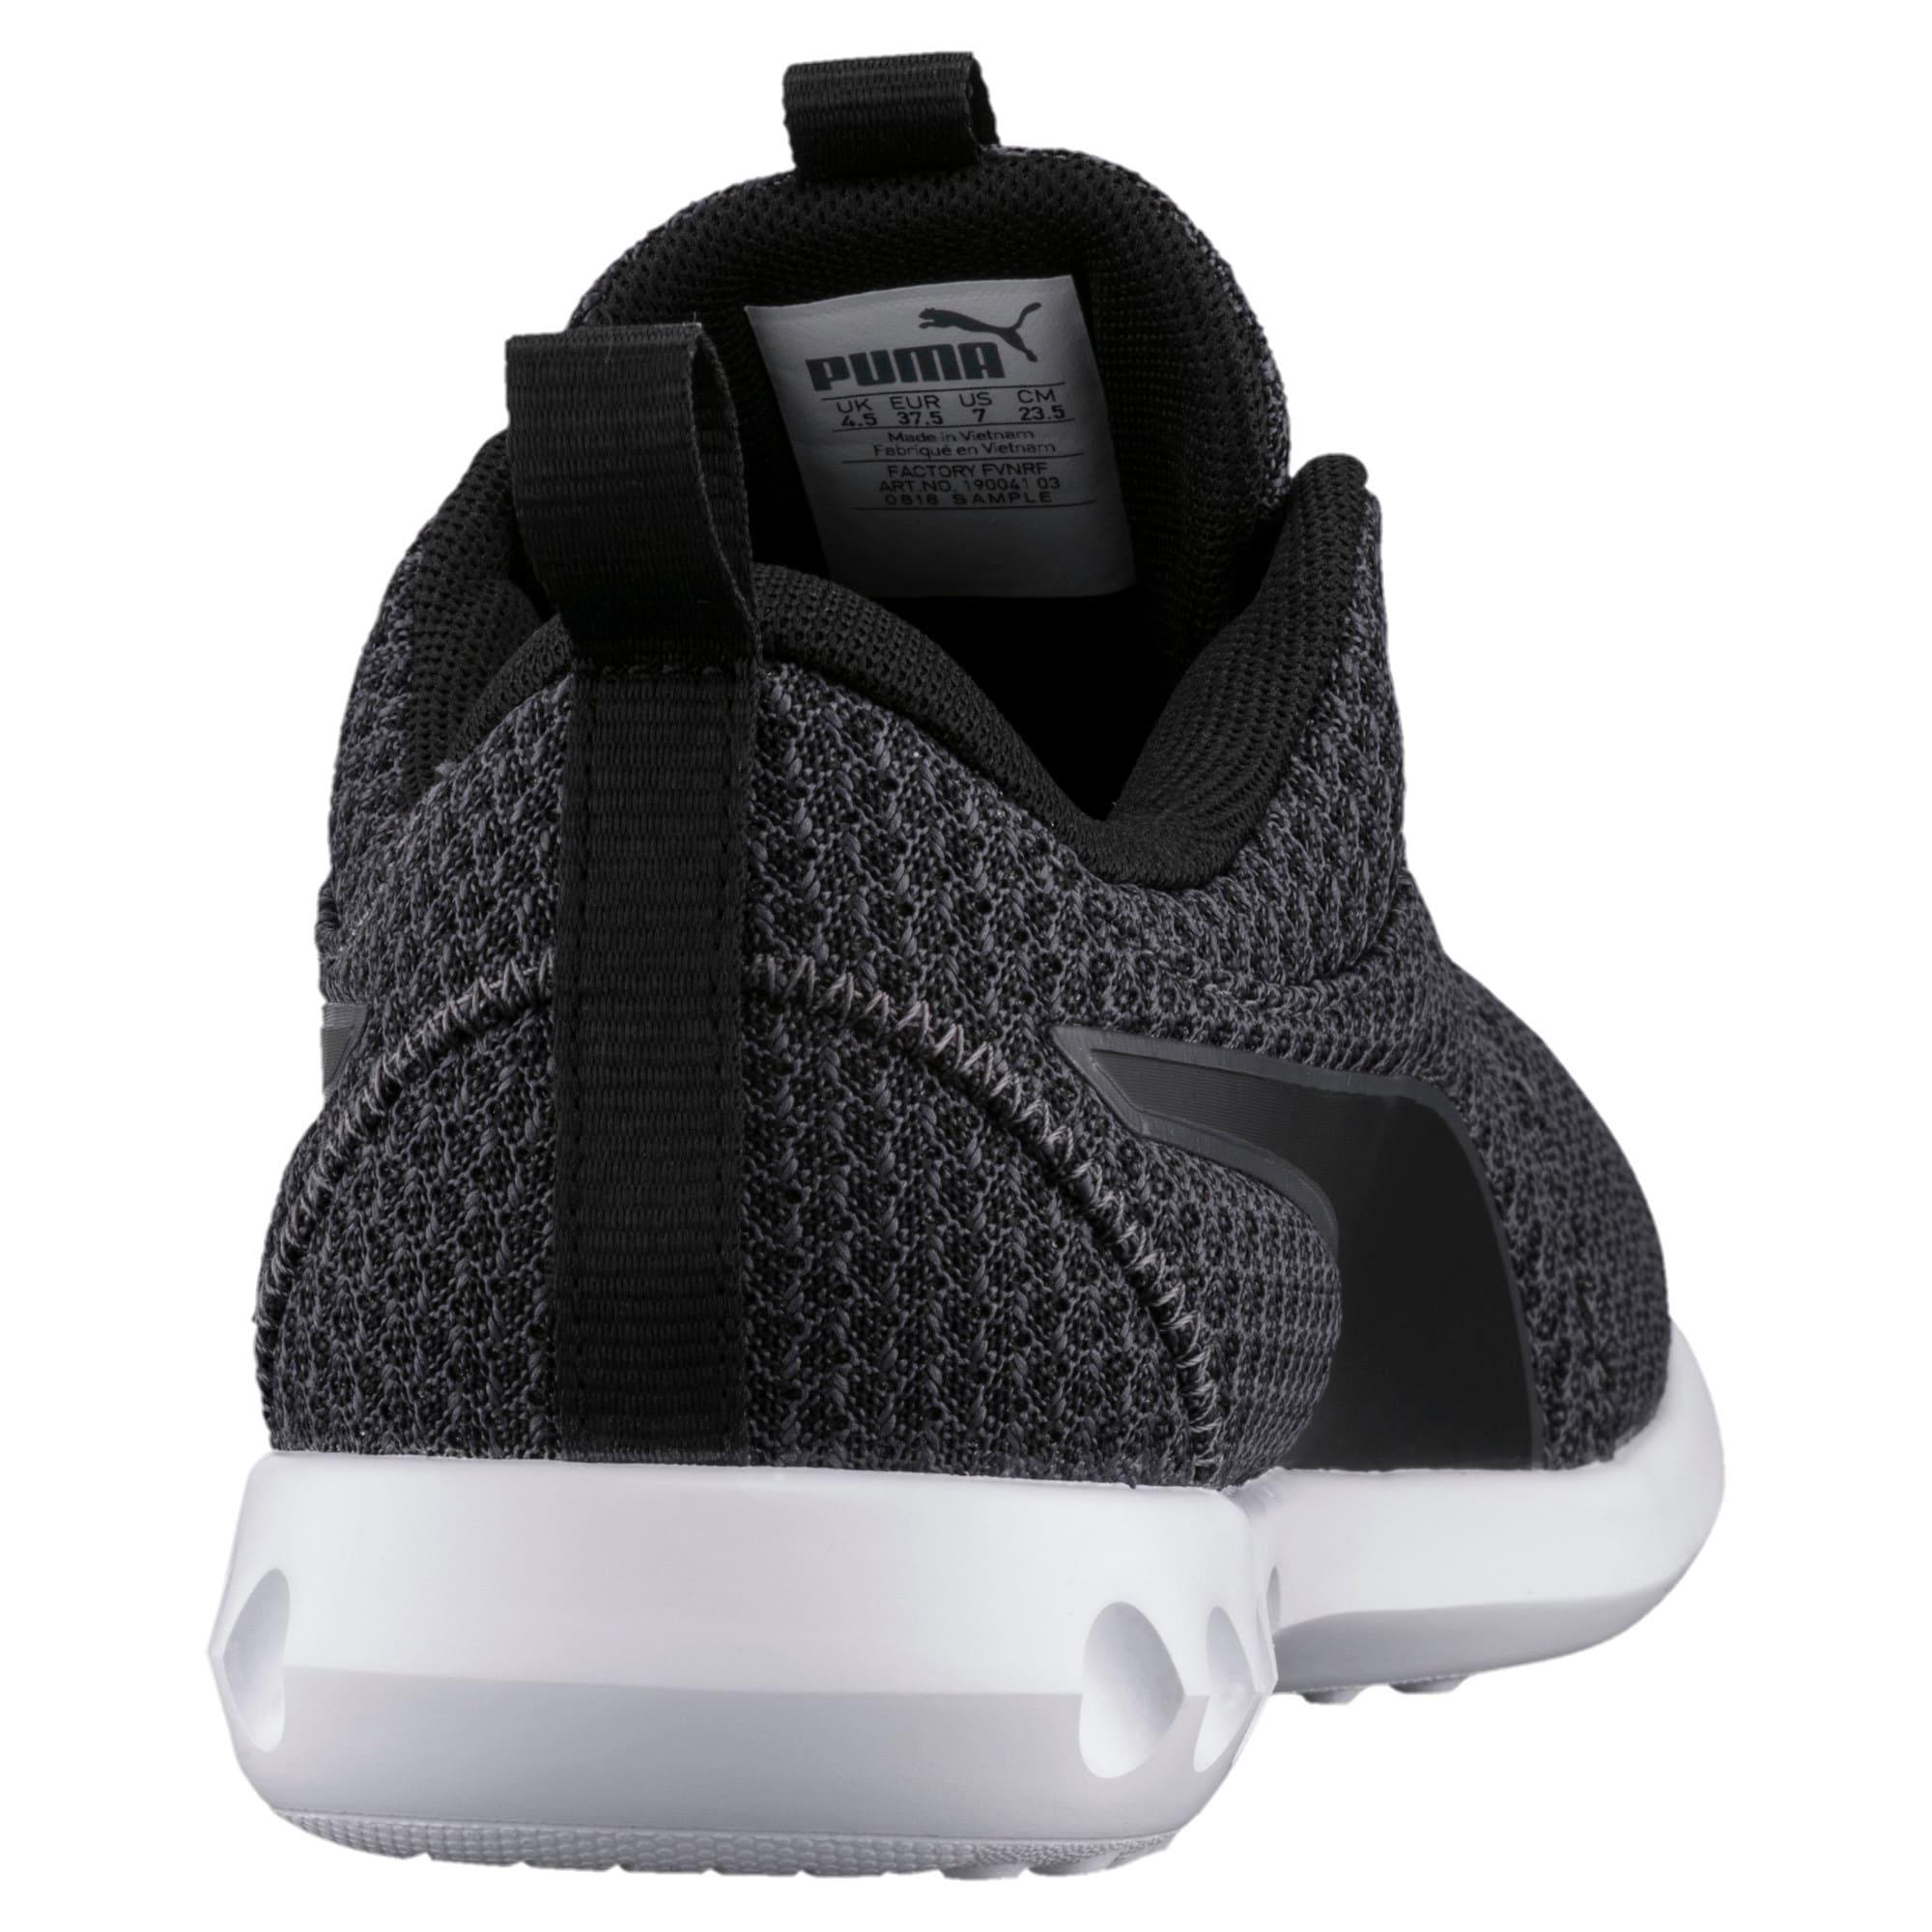 Thumbnail 4 of Carson 2 Knit Women's Running Shoes, Puma Black-Periscope, medium